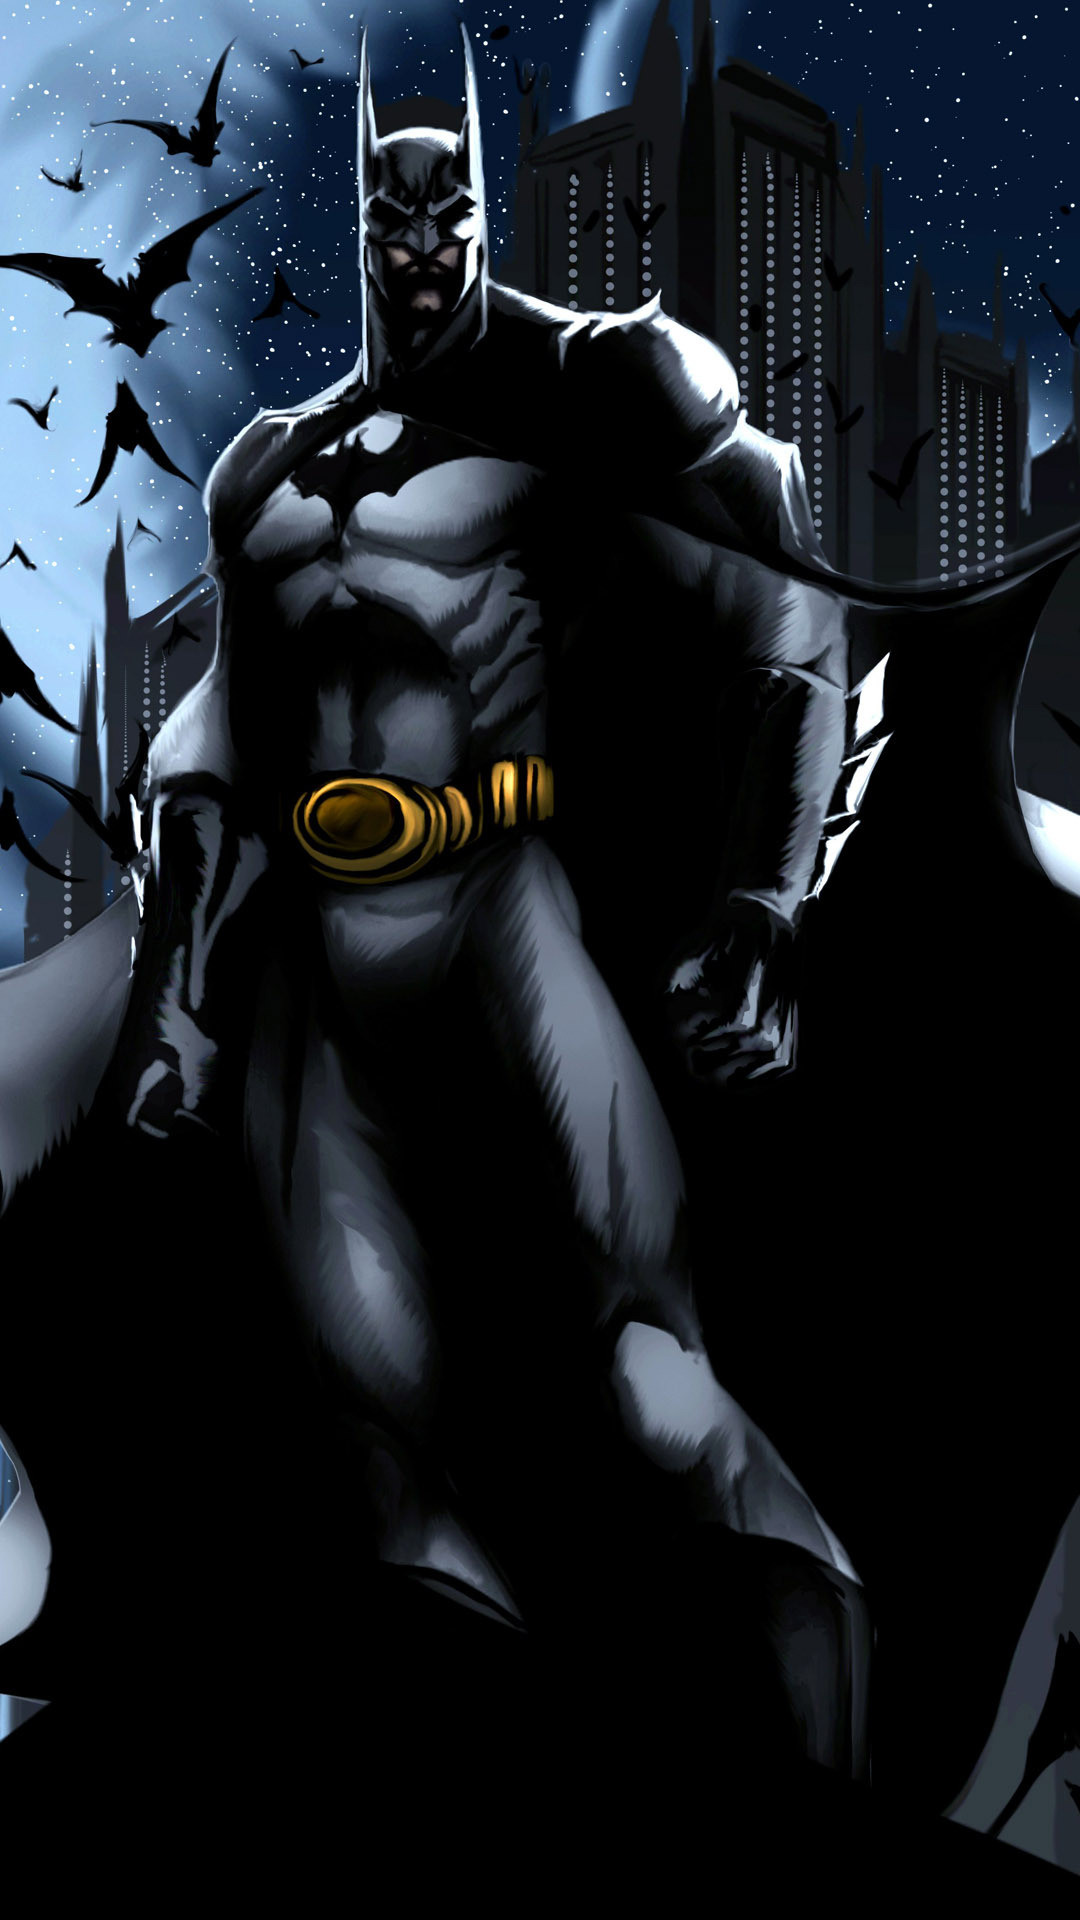 1080x1920 Awesome Fond Decran Iphone Hd 439 Download 2880x1800 Batman Wallpapers